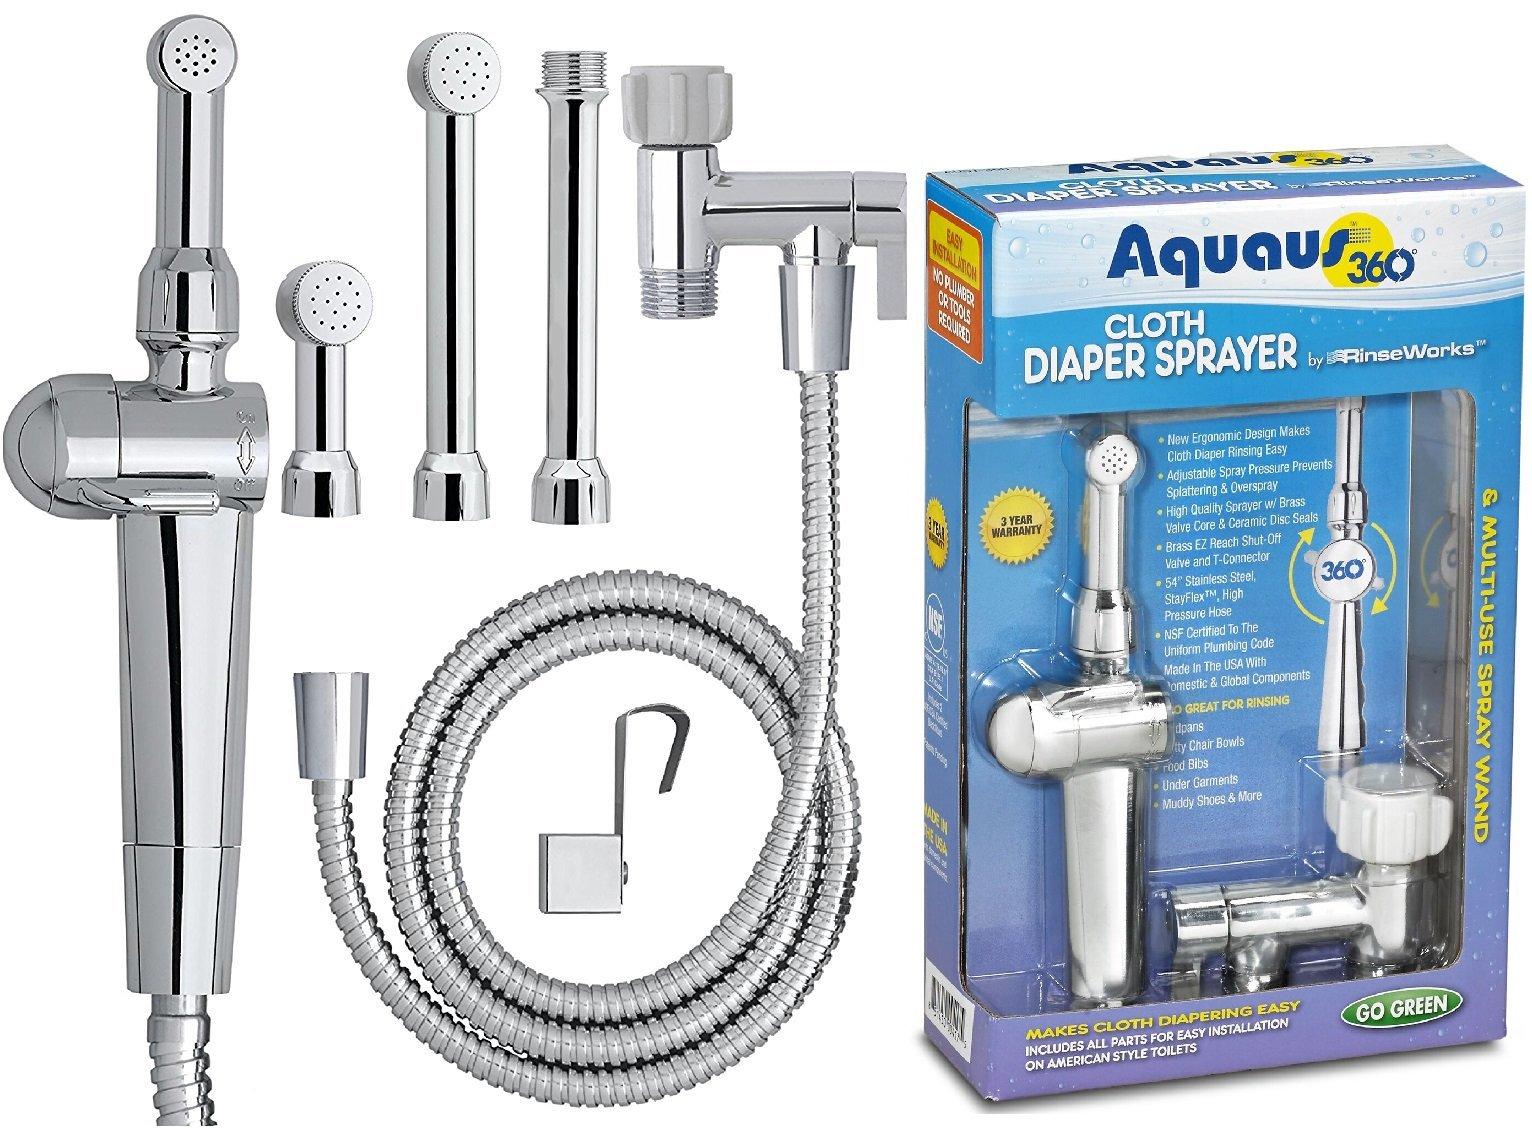 RinseWorks – Patented Aquaus 360 Diaper Sprayer - NSF Certified for Legal Installation - 3 Year Warranty – Dual Spray Pressure Controls – SafeSpray Valve Core, StayFlex Hose